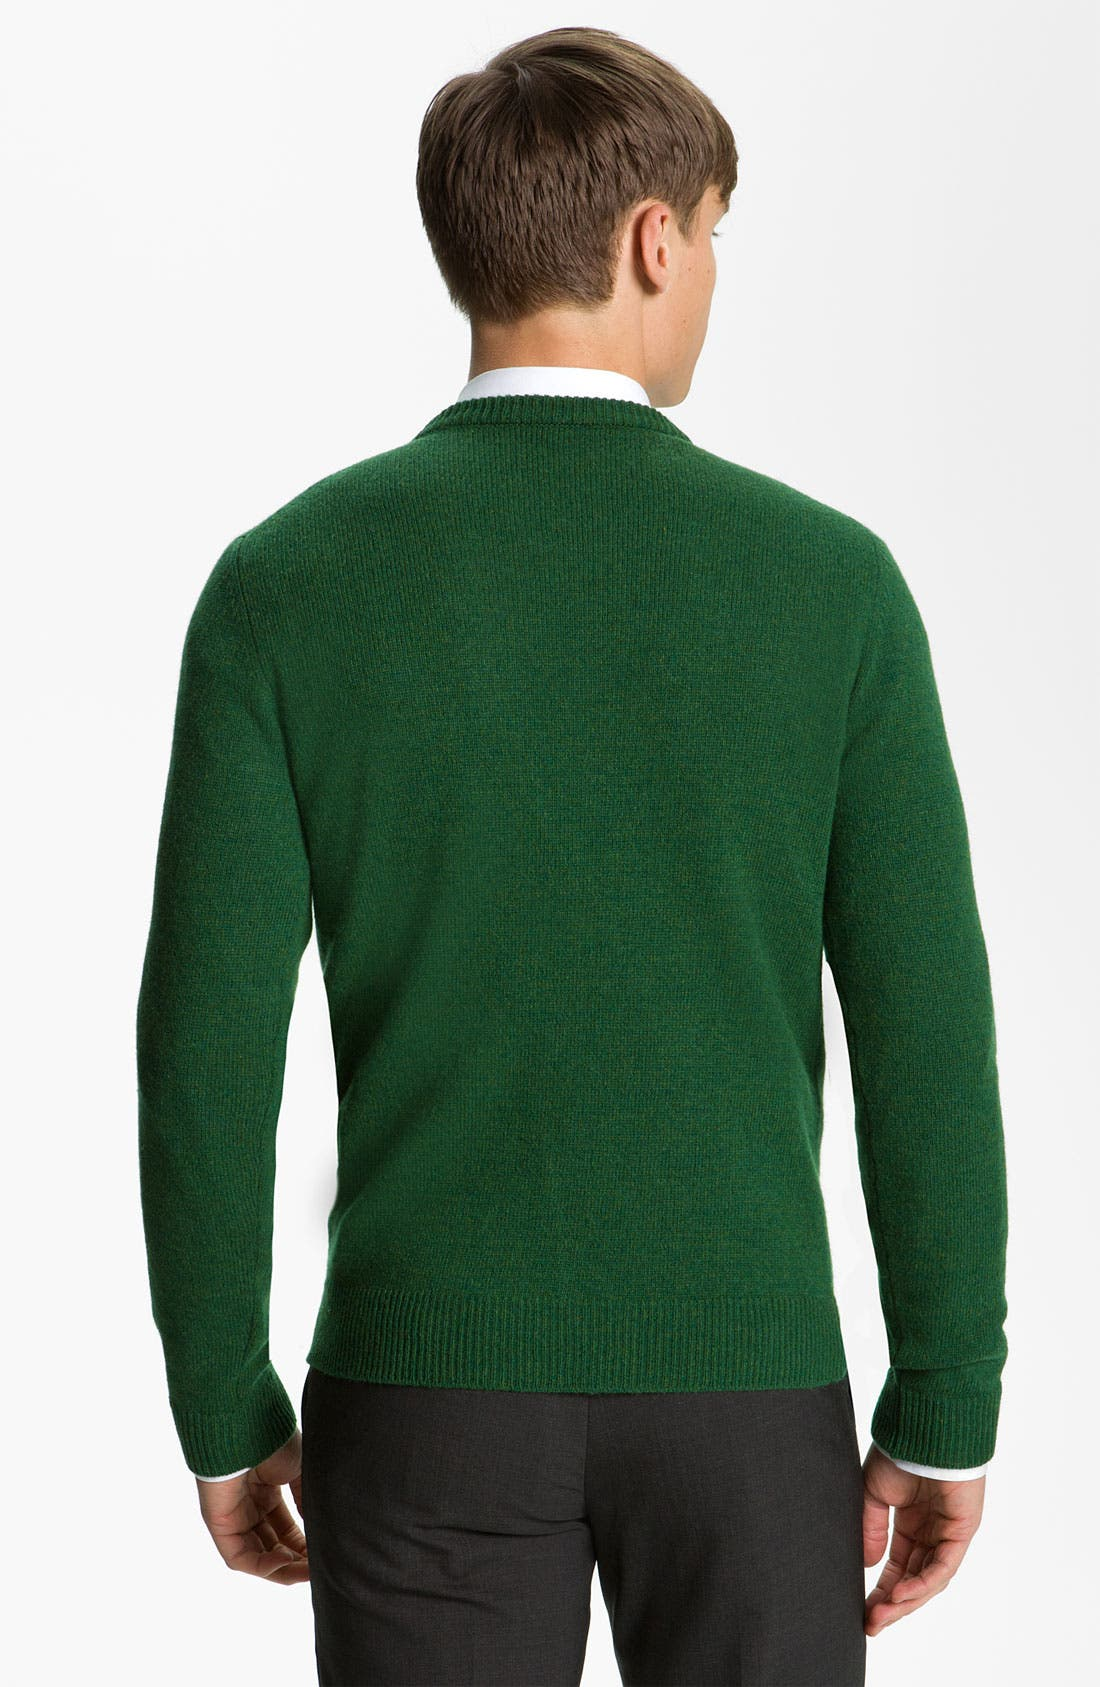 JIL SANDER, Crewneck Sweater, Alternate thumbnail 3, color, 306